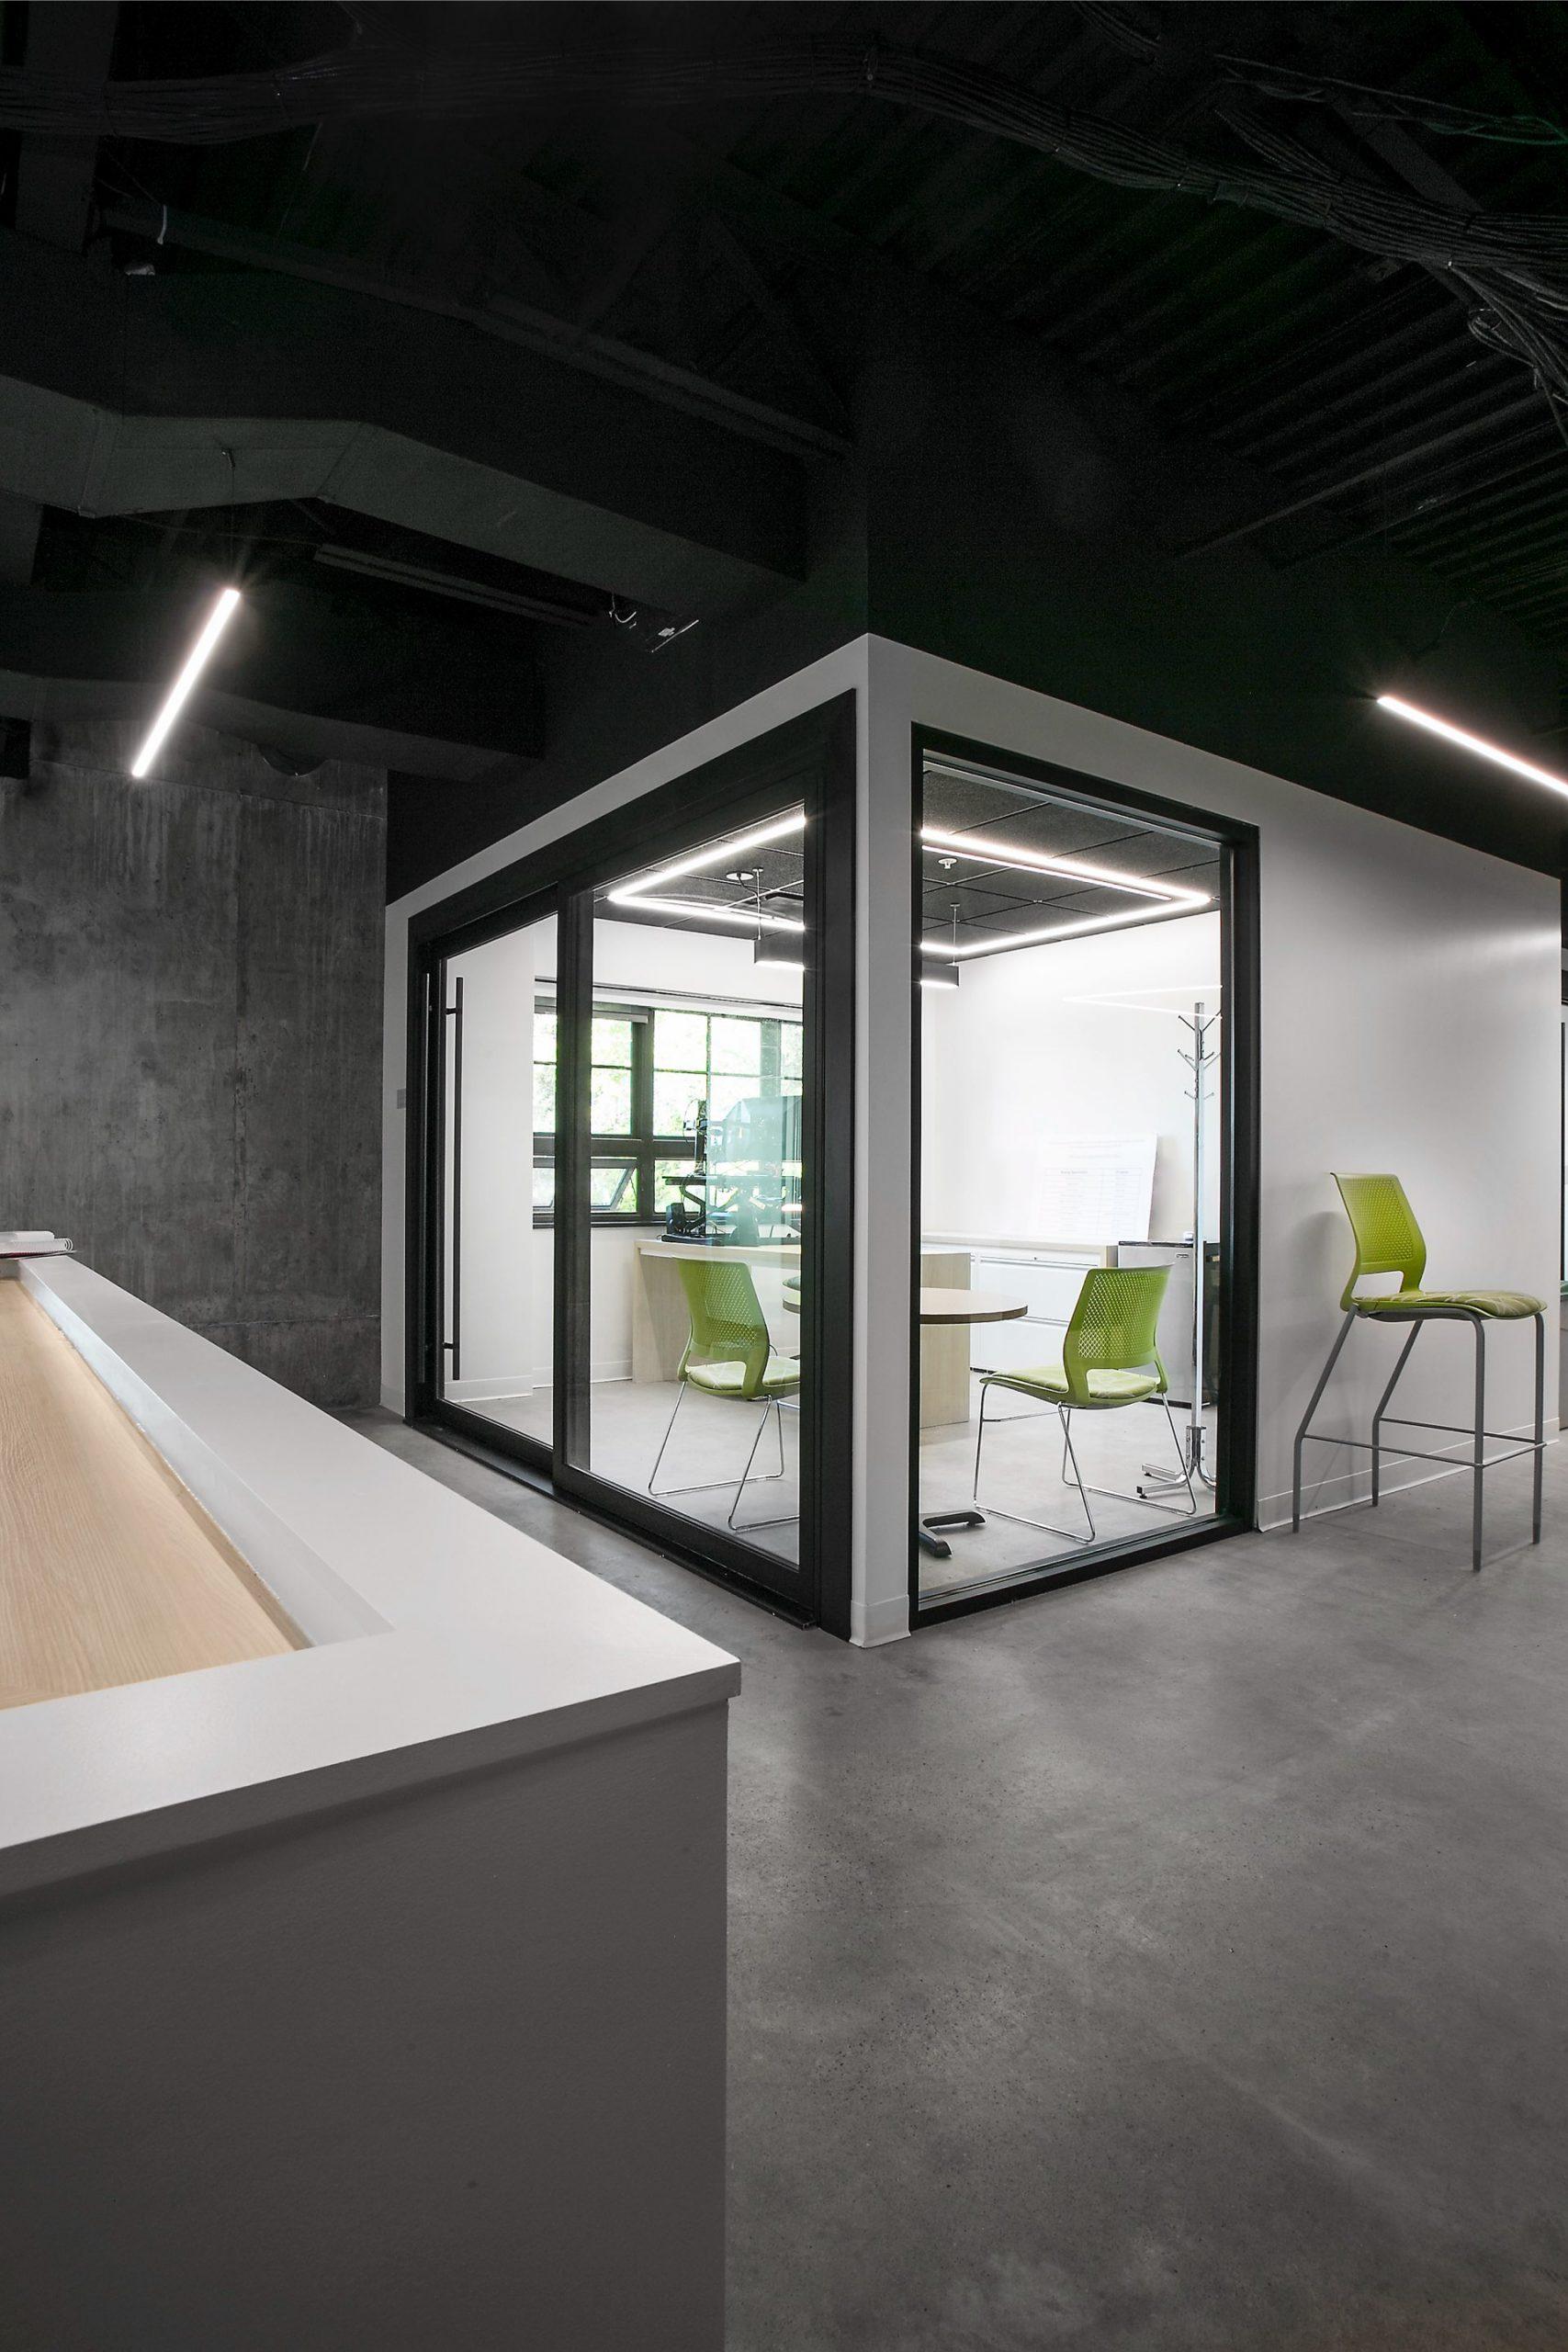 Meeting room, KPCW Radio, architectural design by Elliott Workgroup